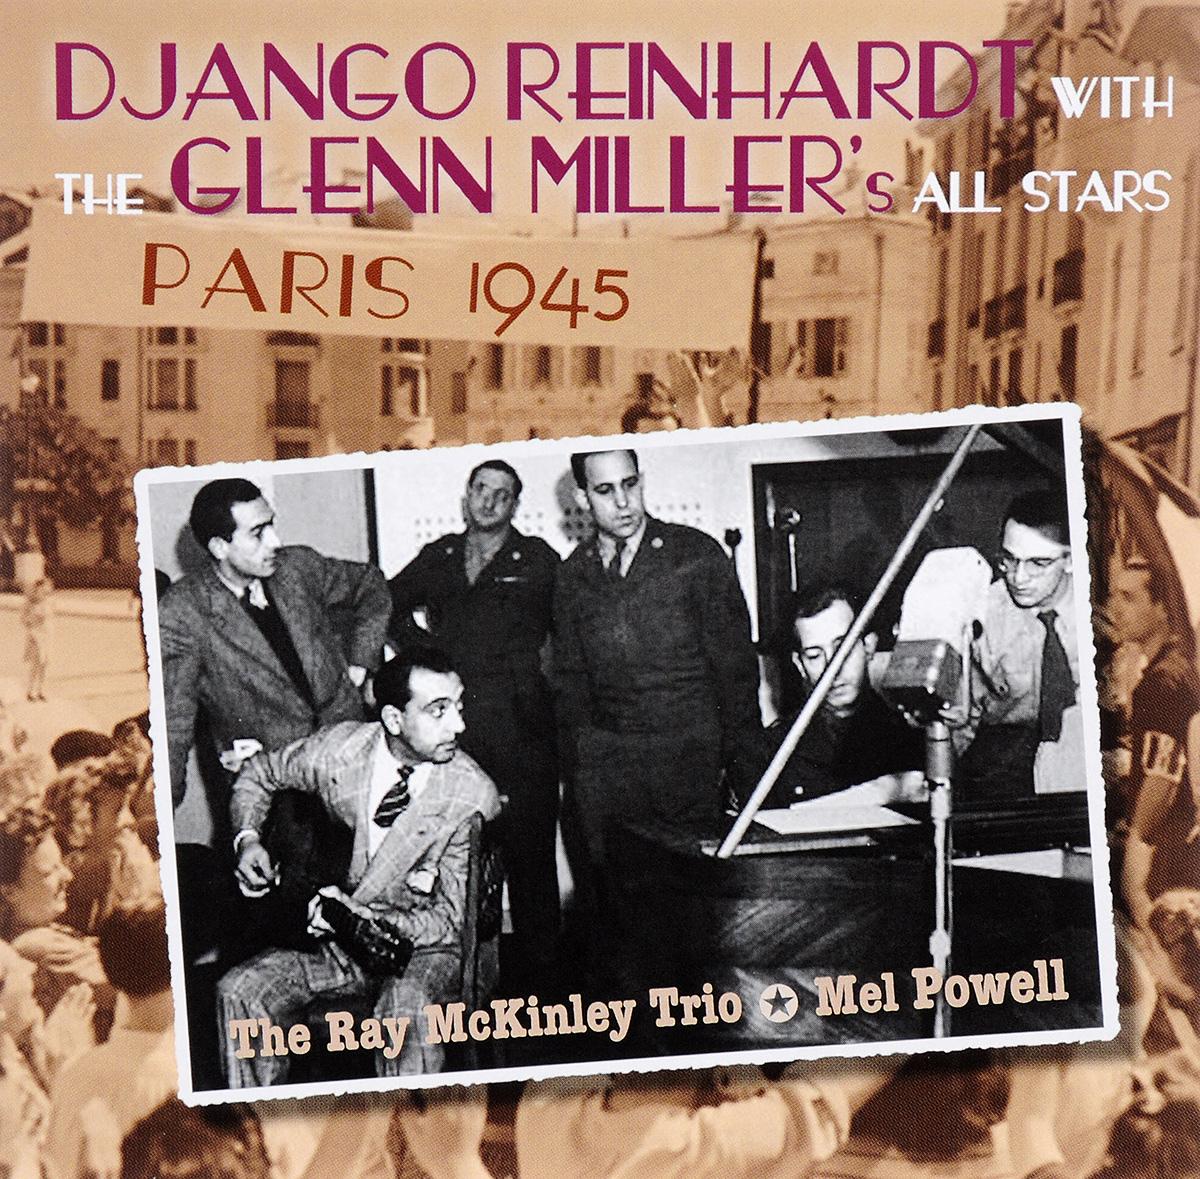 Django Reinhardt With The Glenn Miller's All Stars The Ray McKinley Trio Mel Powell Paris 1945